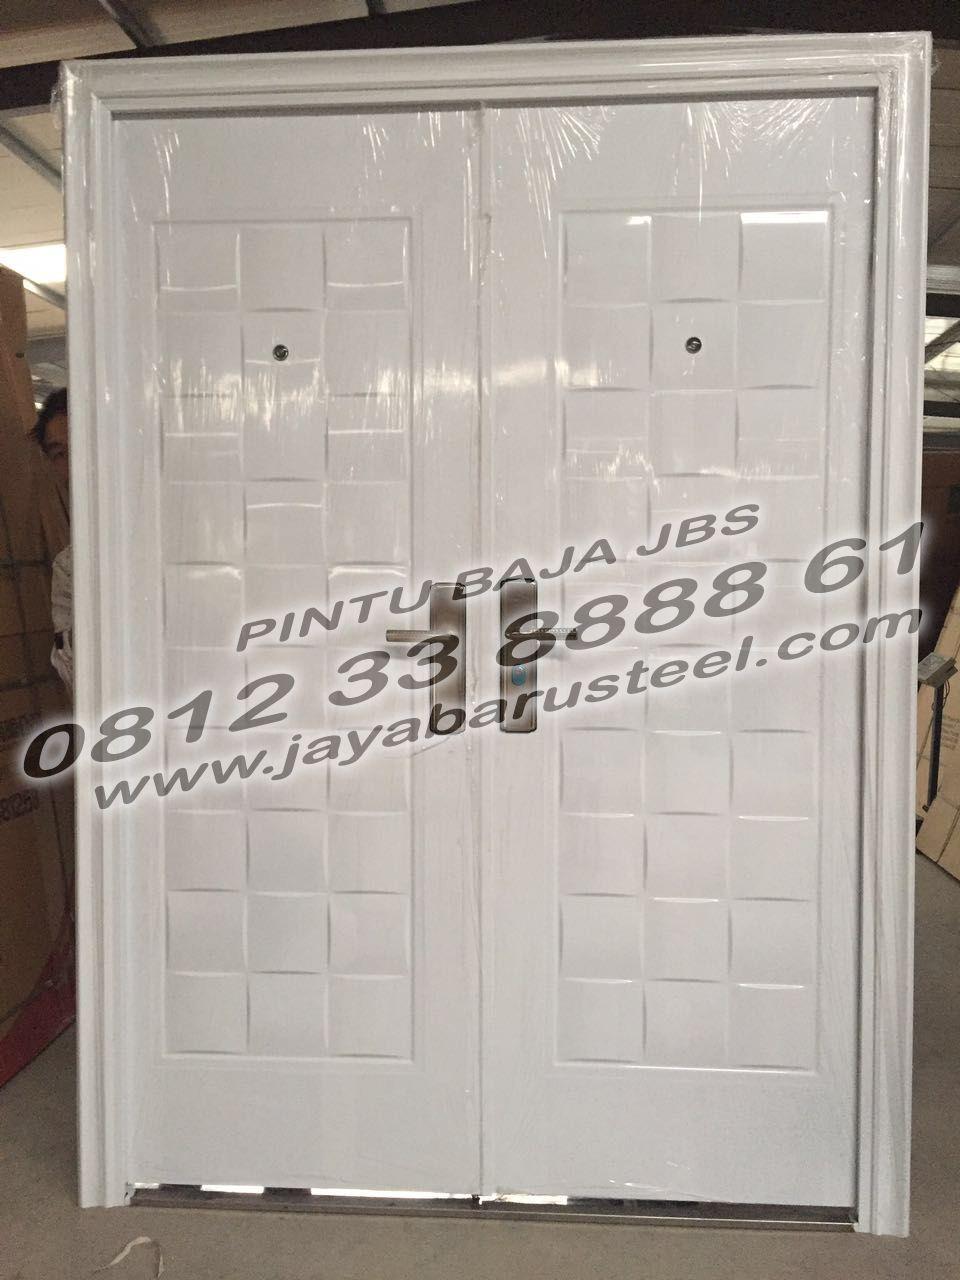 gambar pintu kamar hotel, model pintu kamar hotel…   0812 33 888861